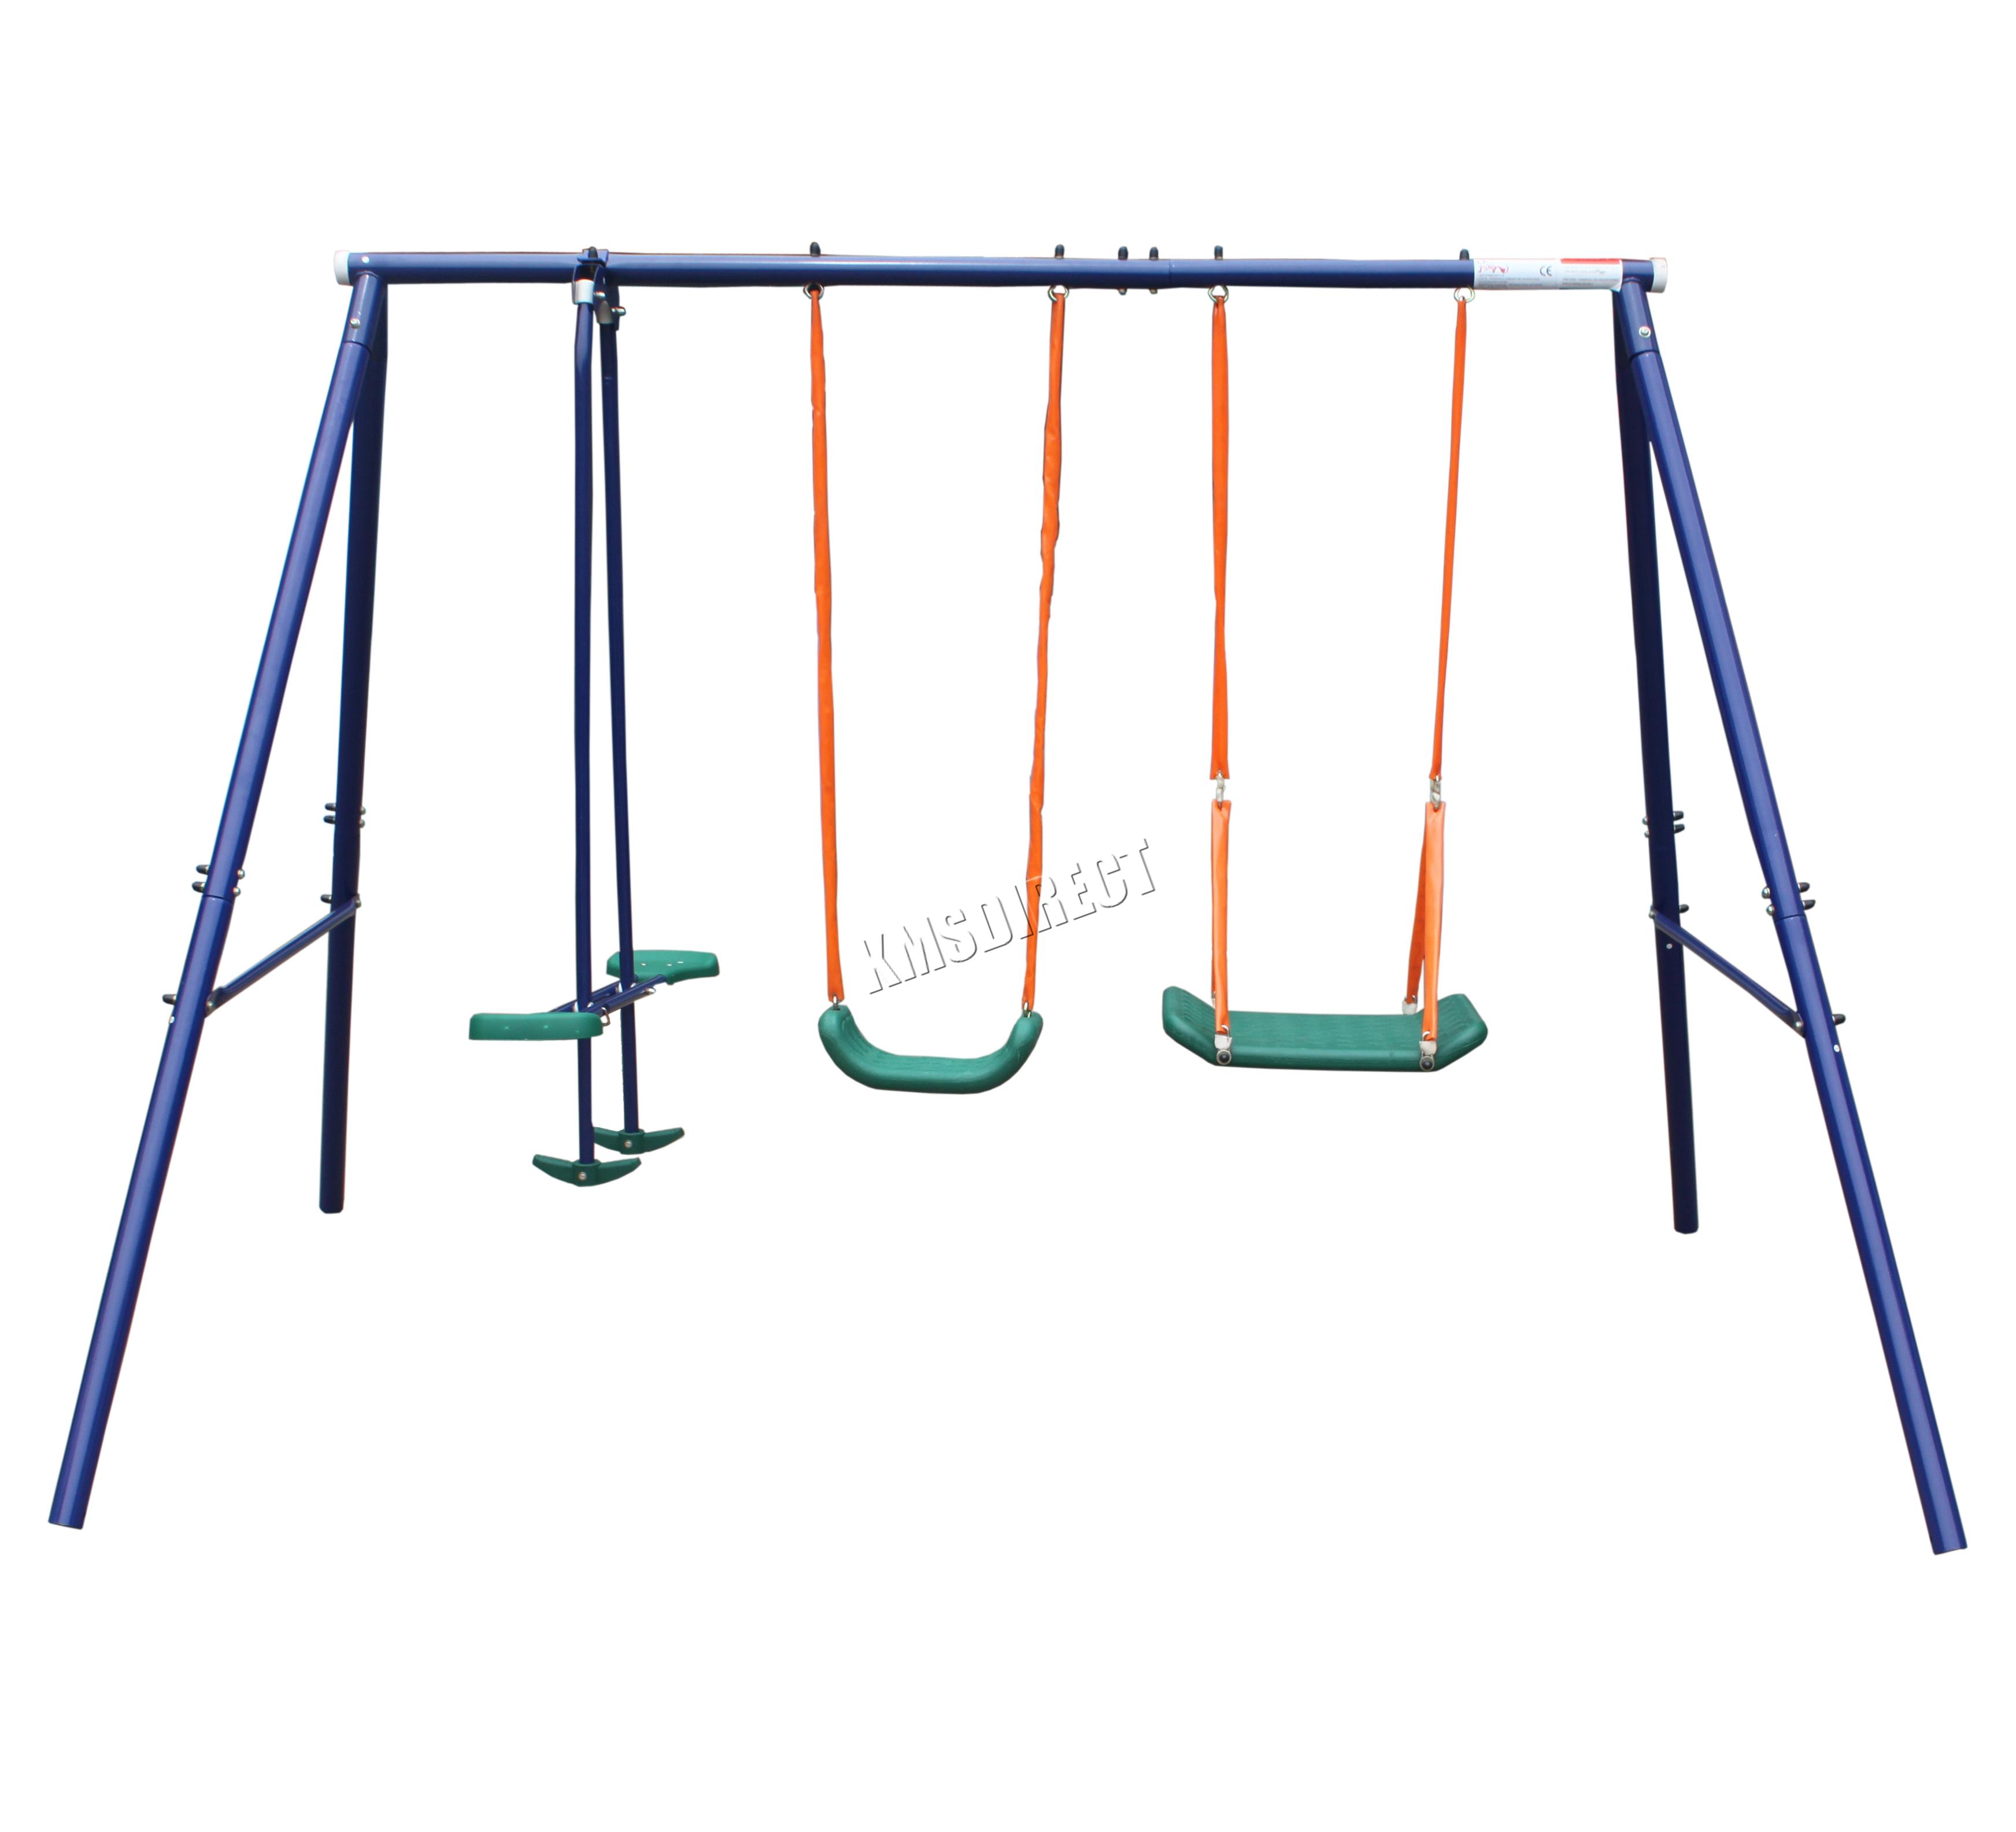 FoxHunter Kids Children Garden Metal Frame Double Seat Swing Set